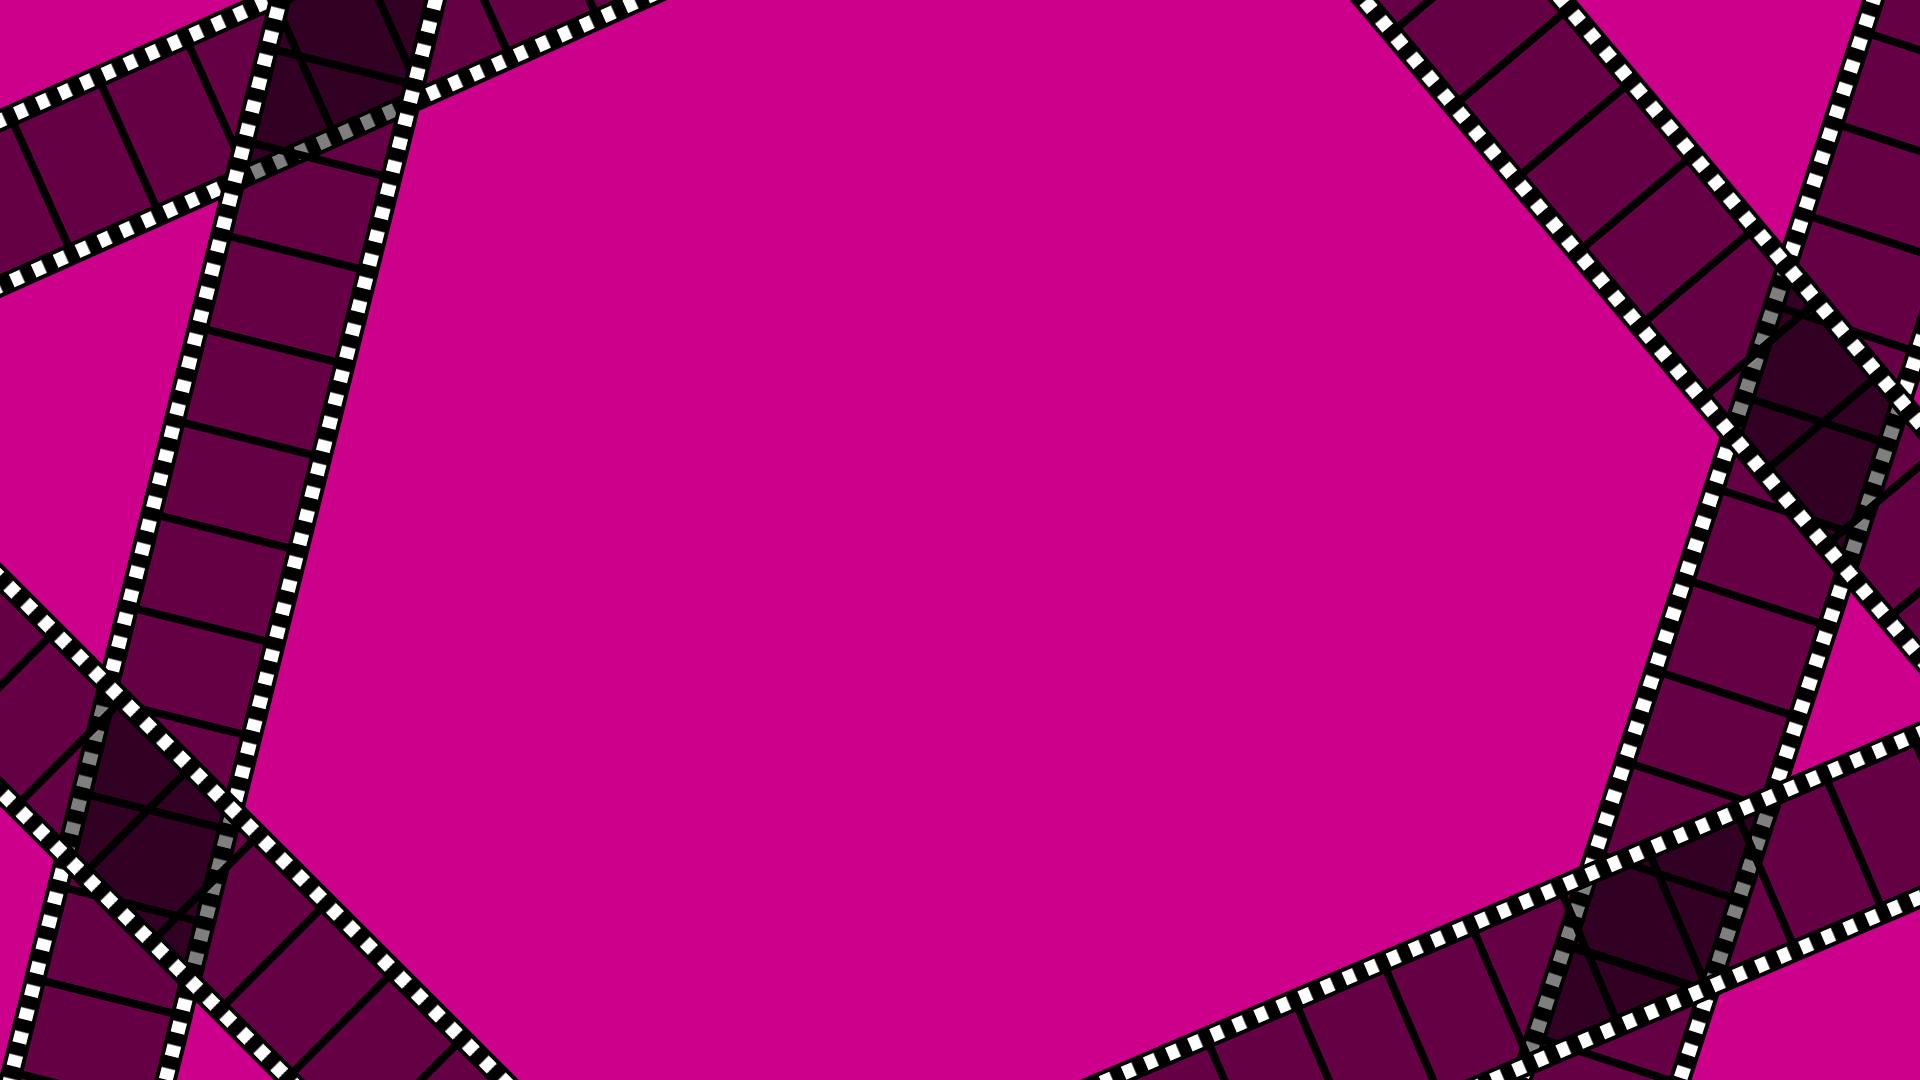 Cute Black And Pink Wallpaper 2 Hd Wallpaper